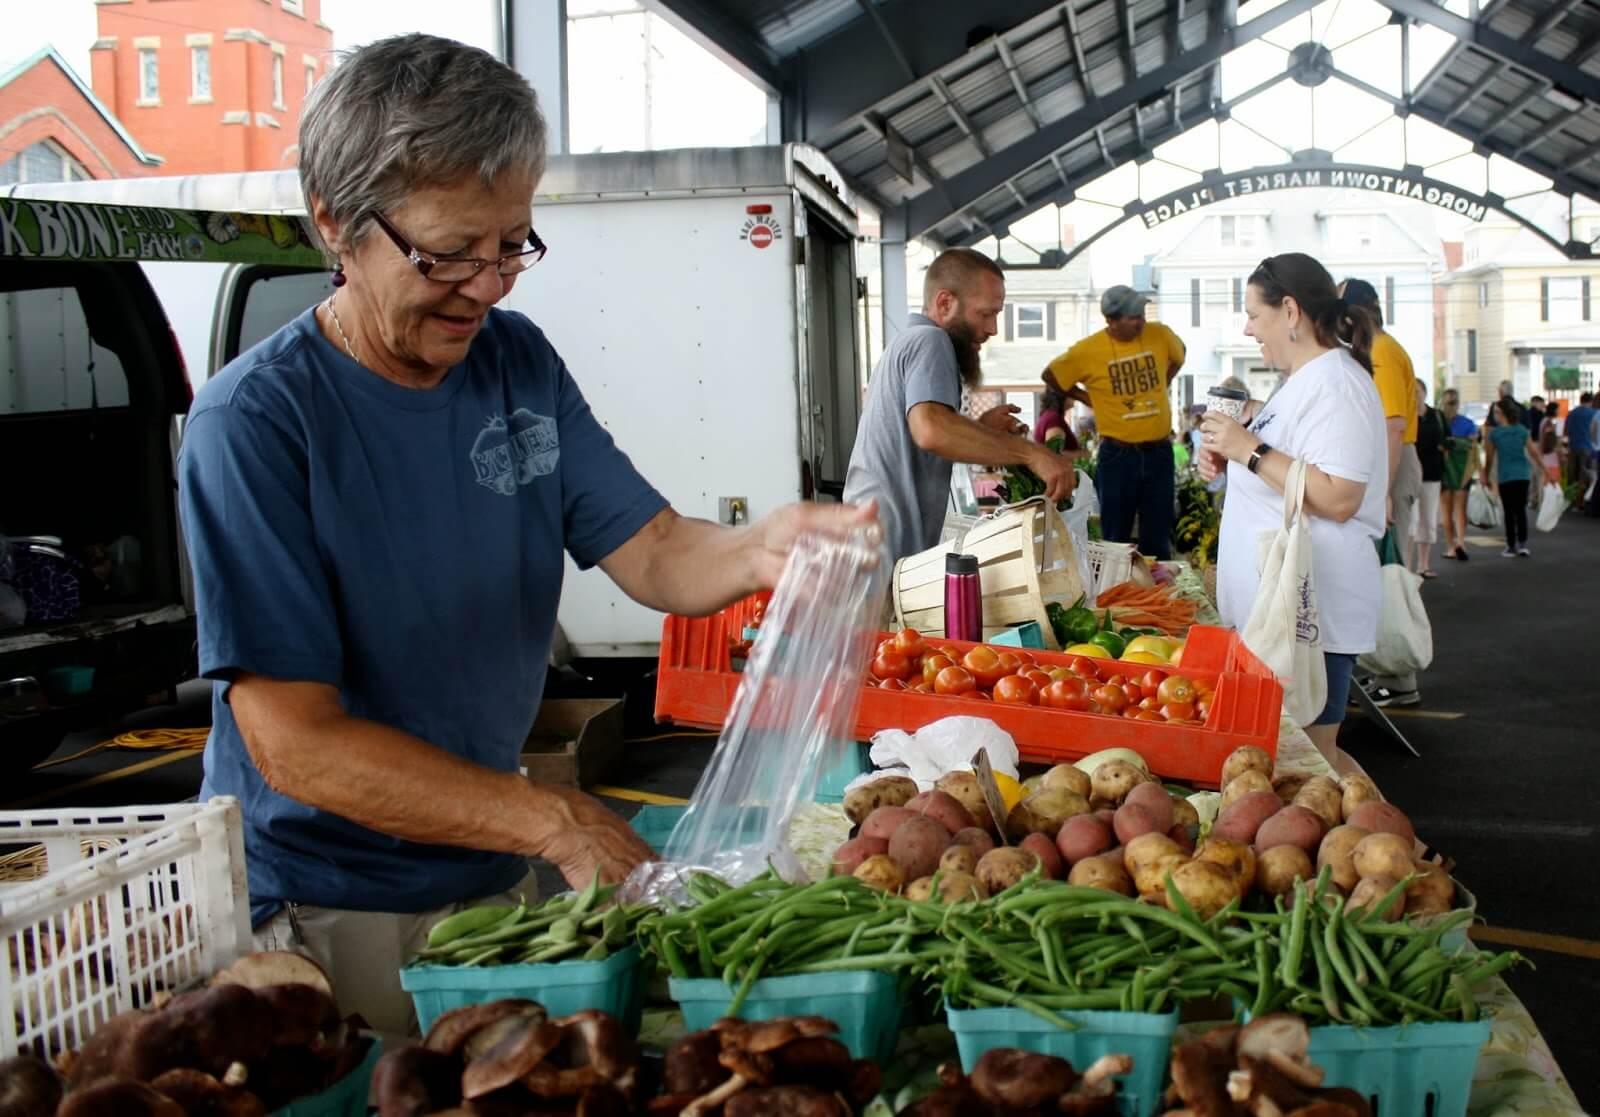 sorting vegetables at morgantown farmers market